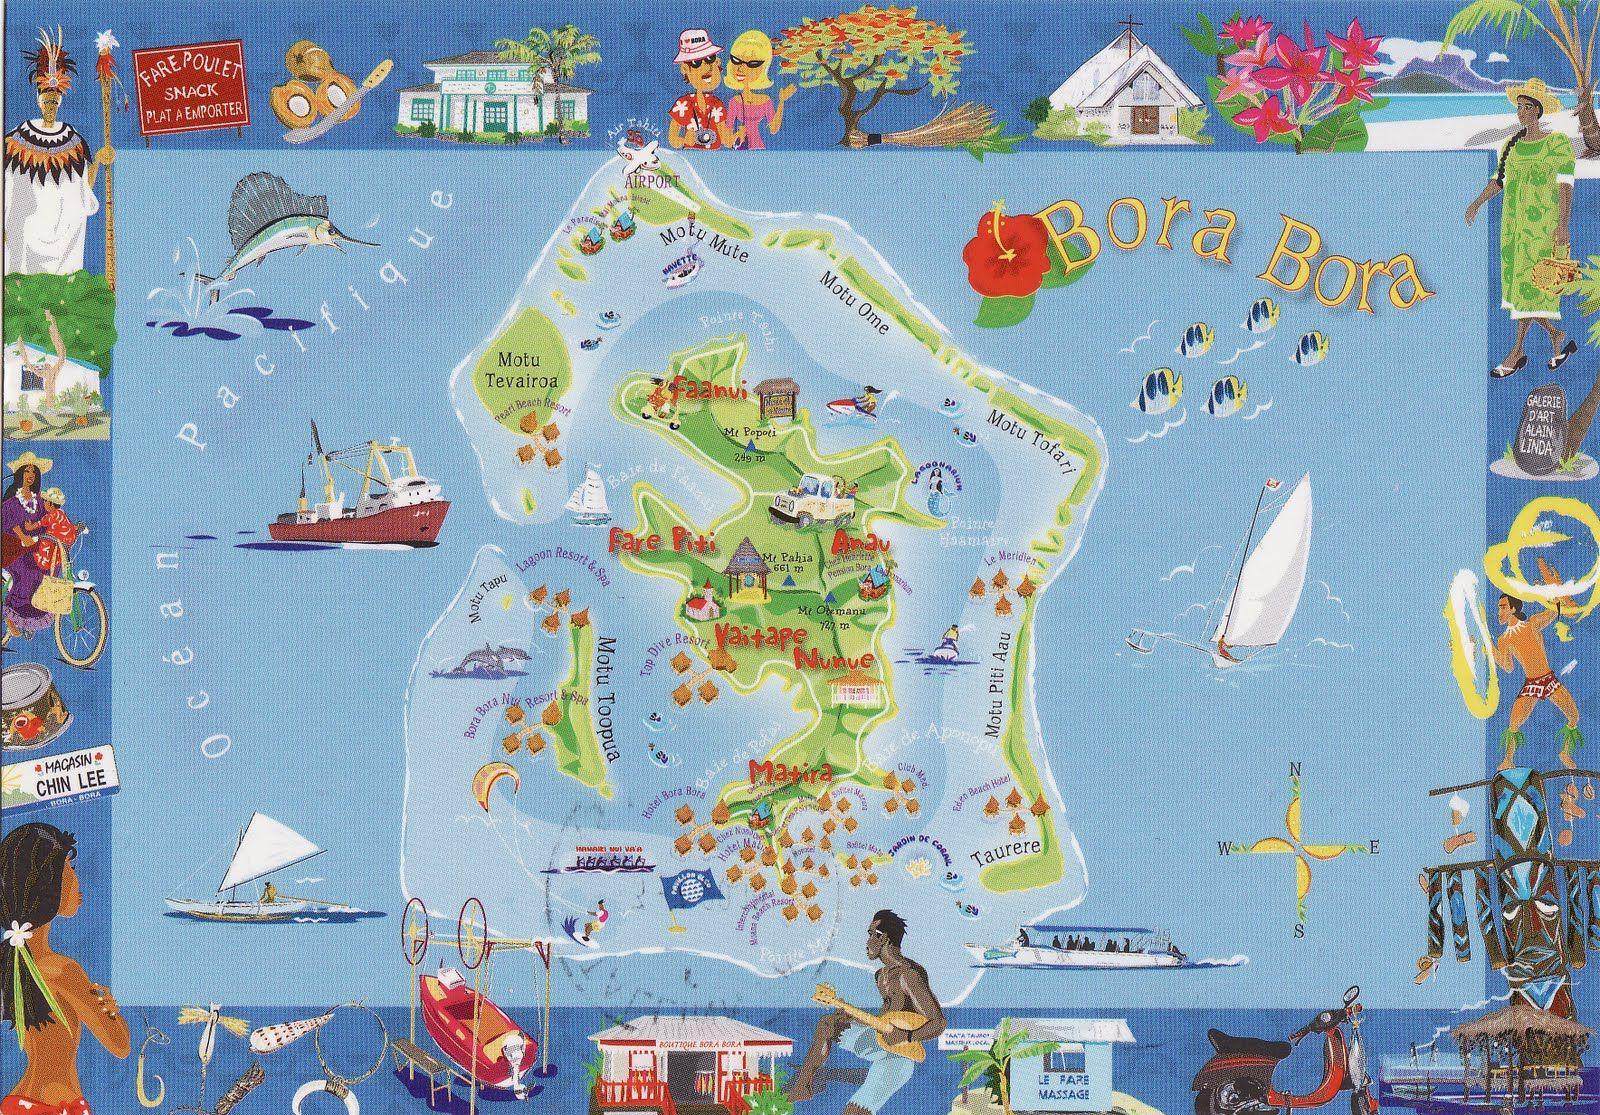 Bora bora island map maps pinterest bora bora island bora french polynesia bora bora map of the island gumiabroncs Image collections